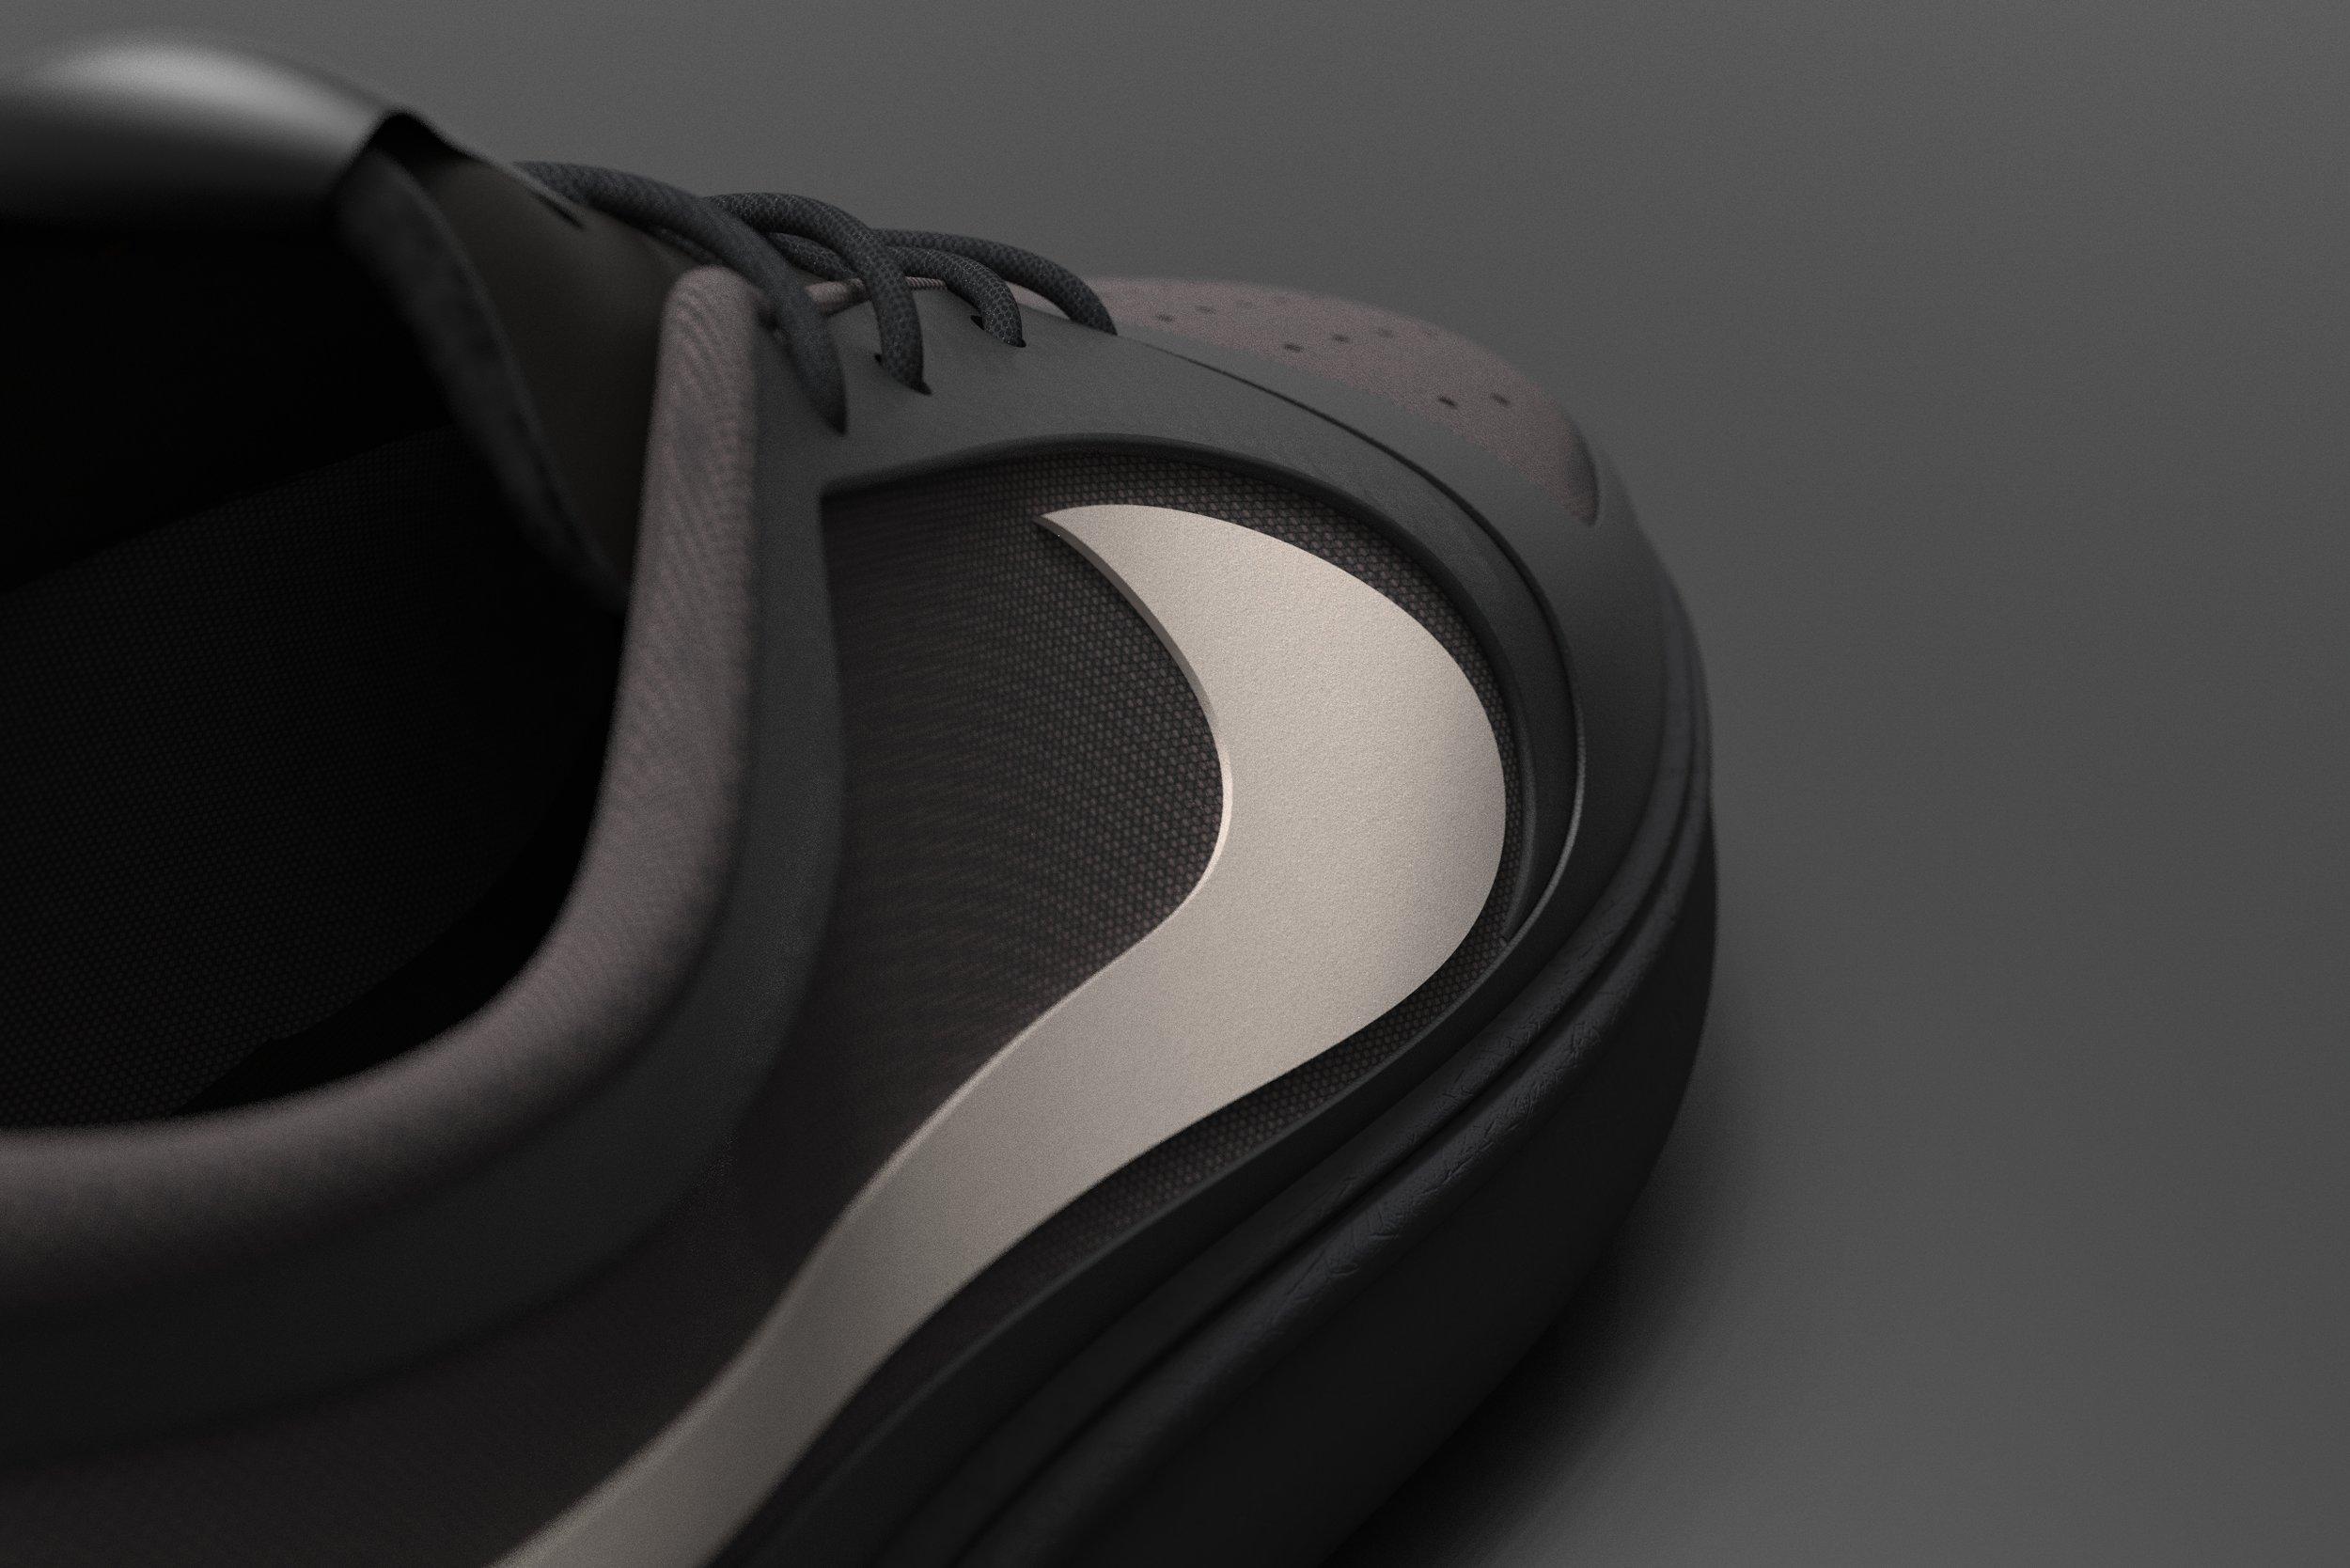 Shoe OFFSET COLOR WAY.25.jpg